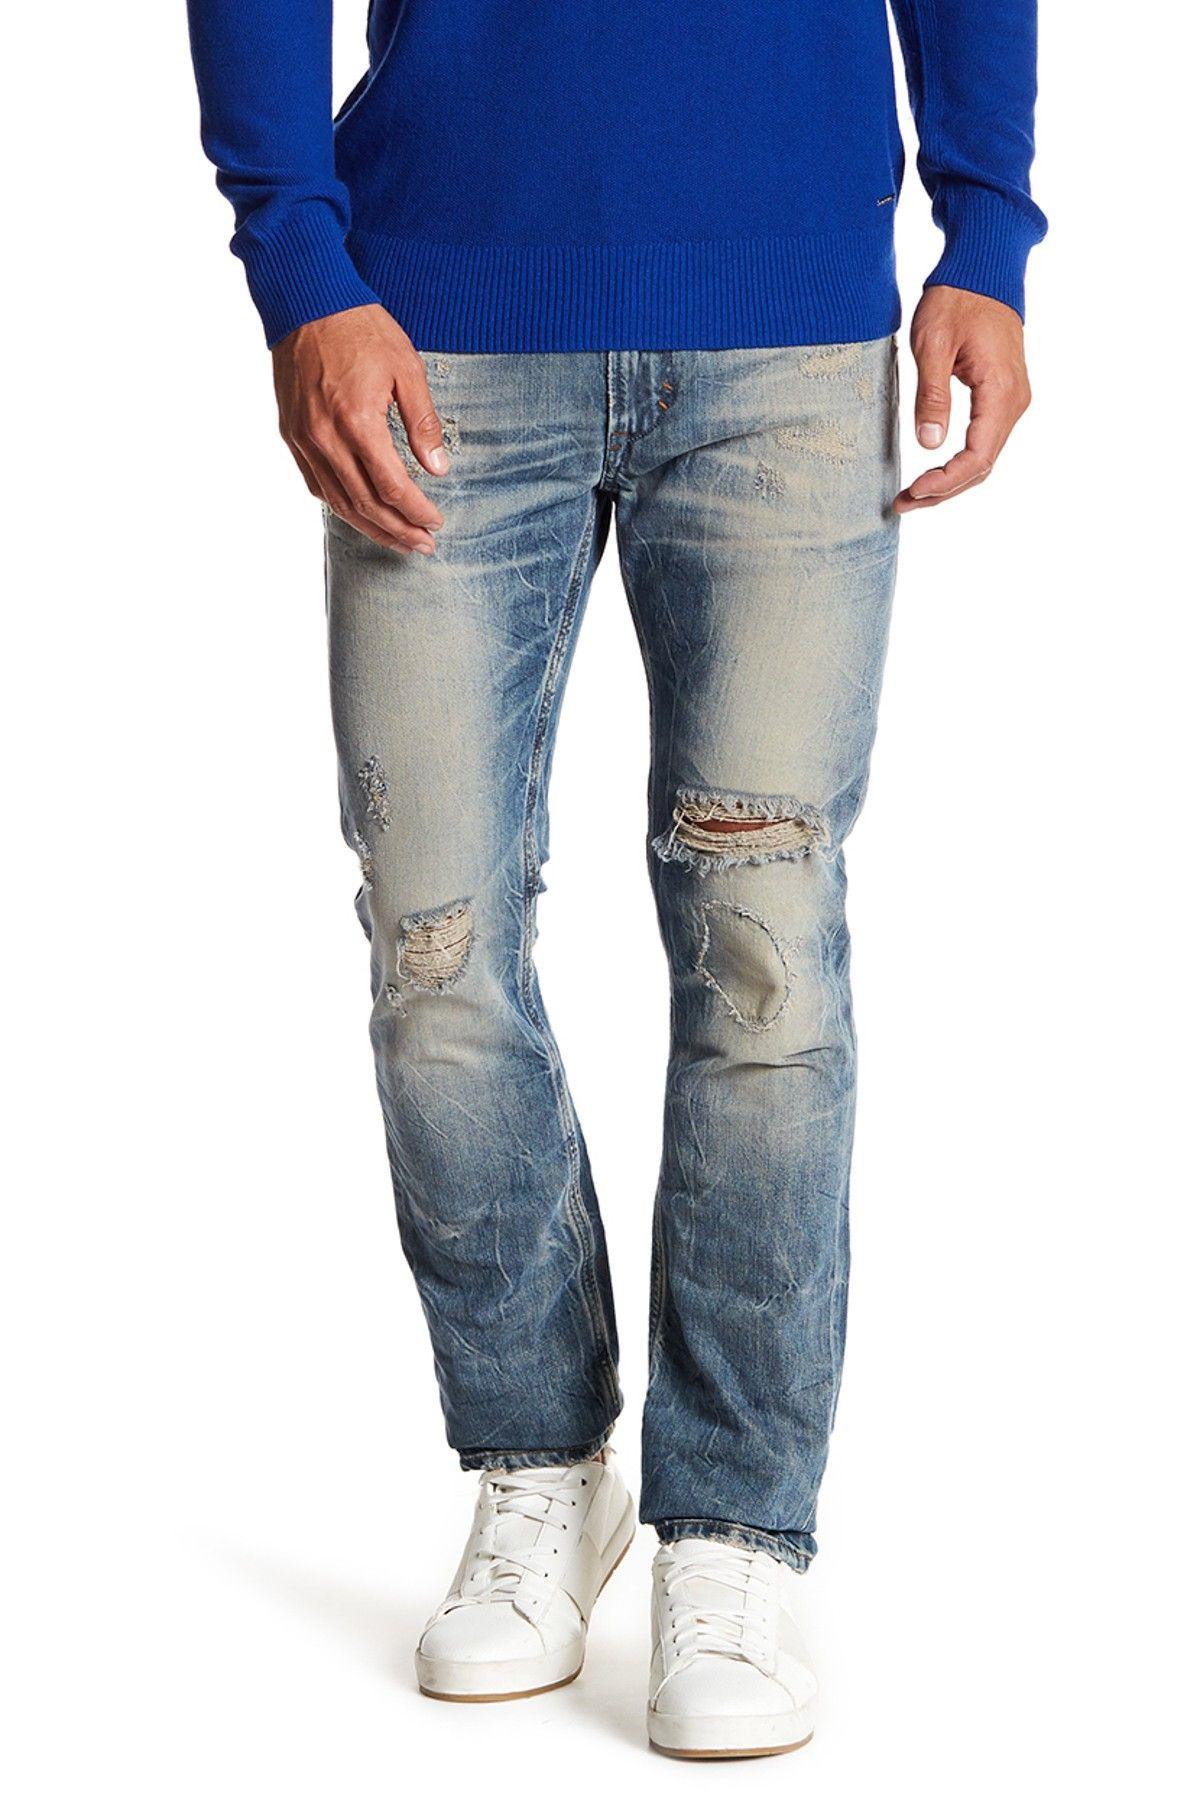 001d1042 Diesel Thavar Slim Skinny Jeans Urban Fashion, Men's Fashion, Diesel,  Nordstrom Rack,